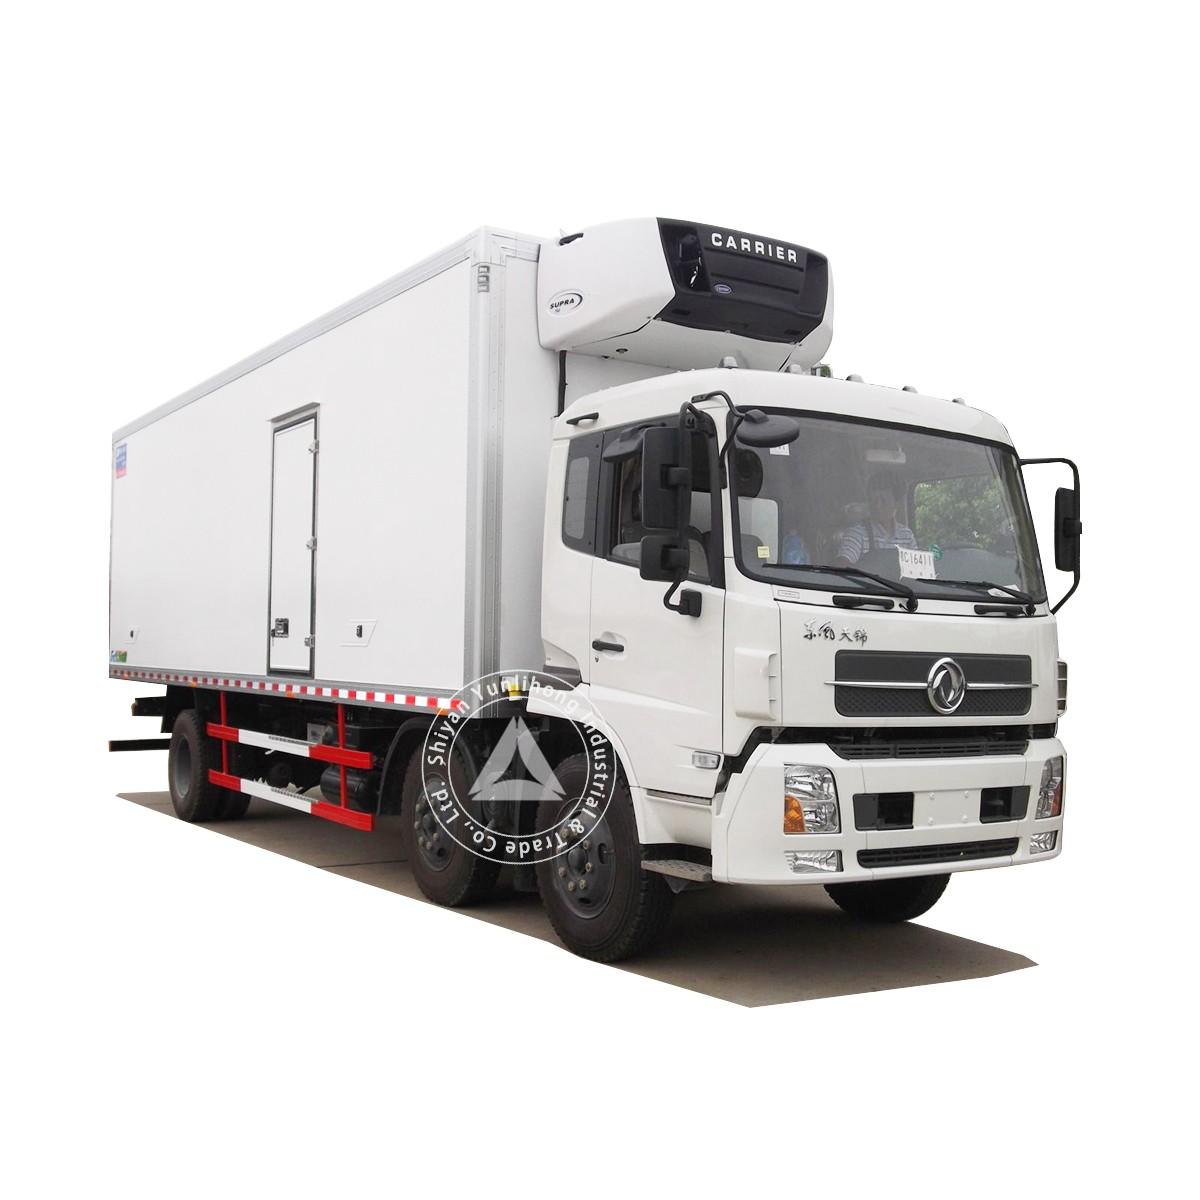 Dongfeng KR 4x2 GVW 16-тонная городская распределительная коробка Грузовая машина